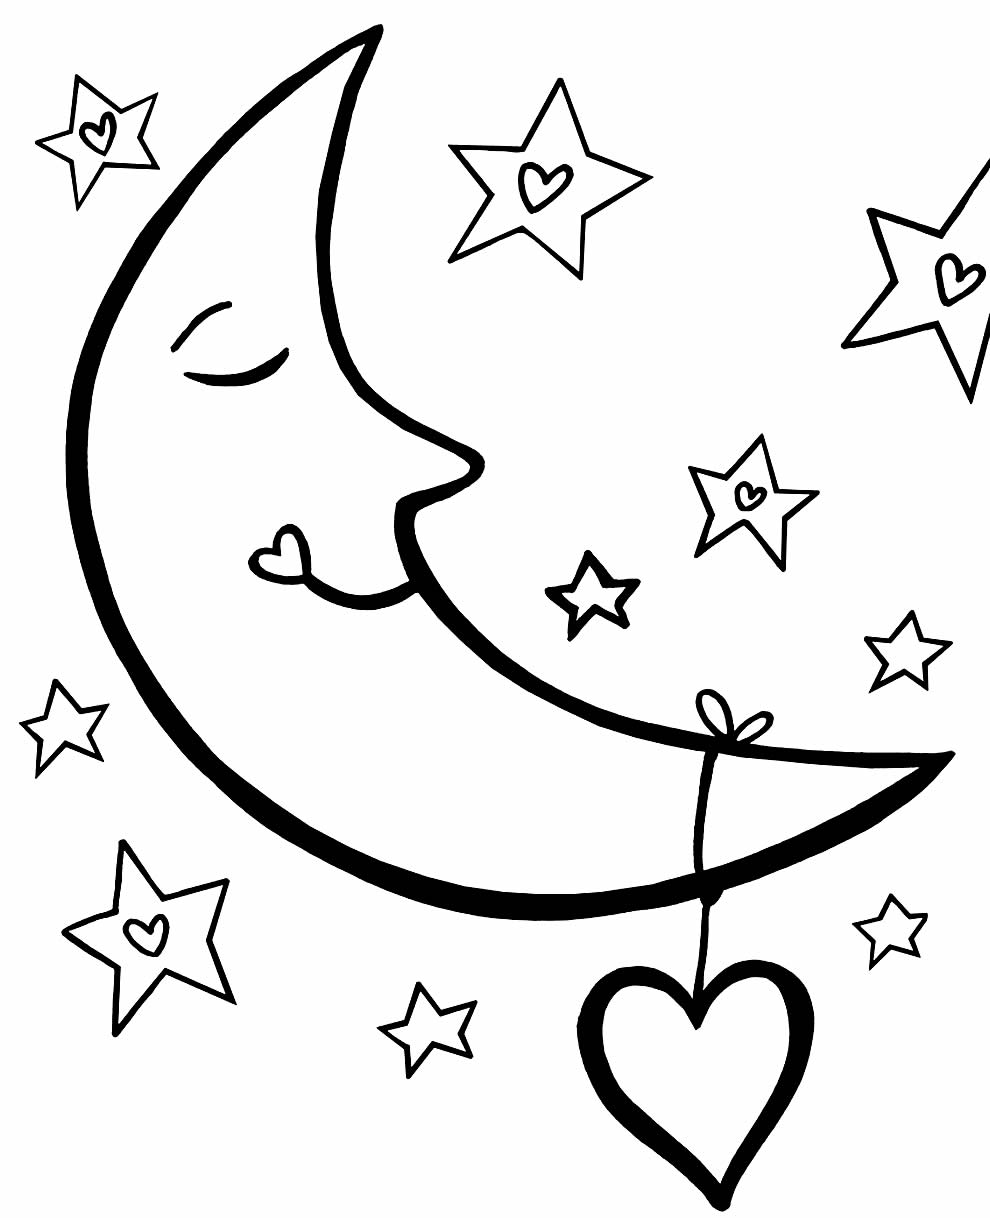 Imagem de Estrelas de Natal para colorir